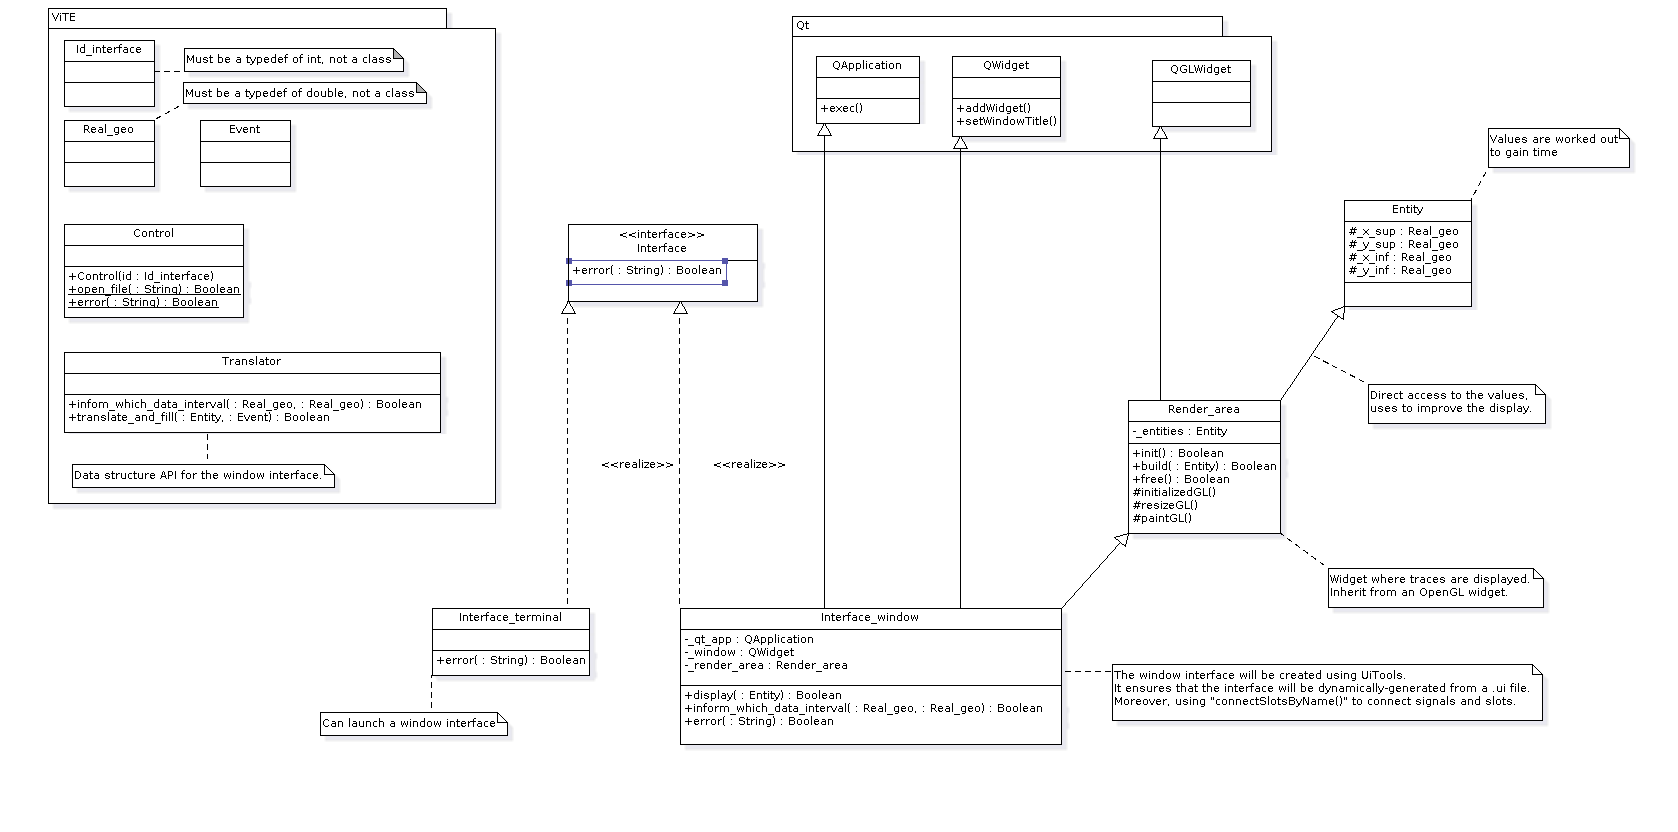 docs/management/interface/class diagram/UC_V1.png